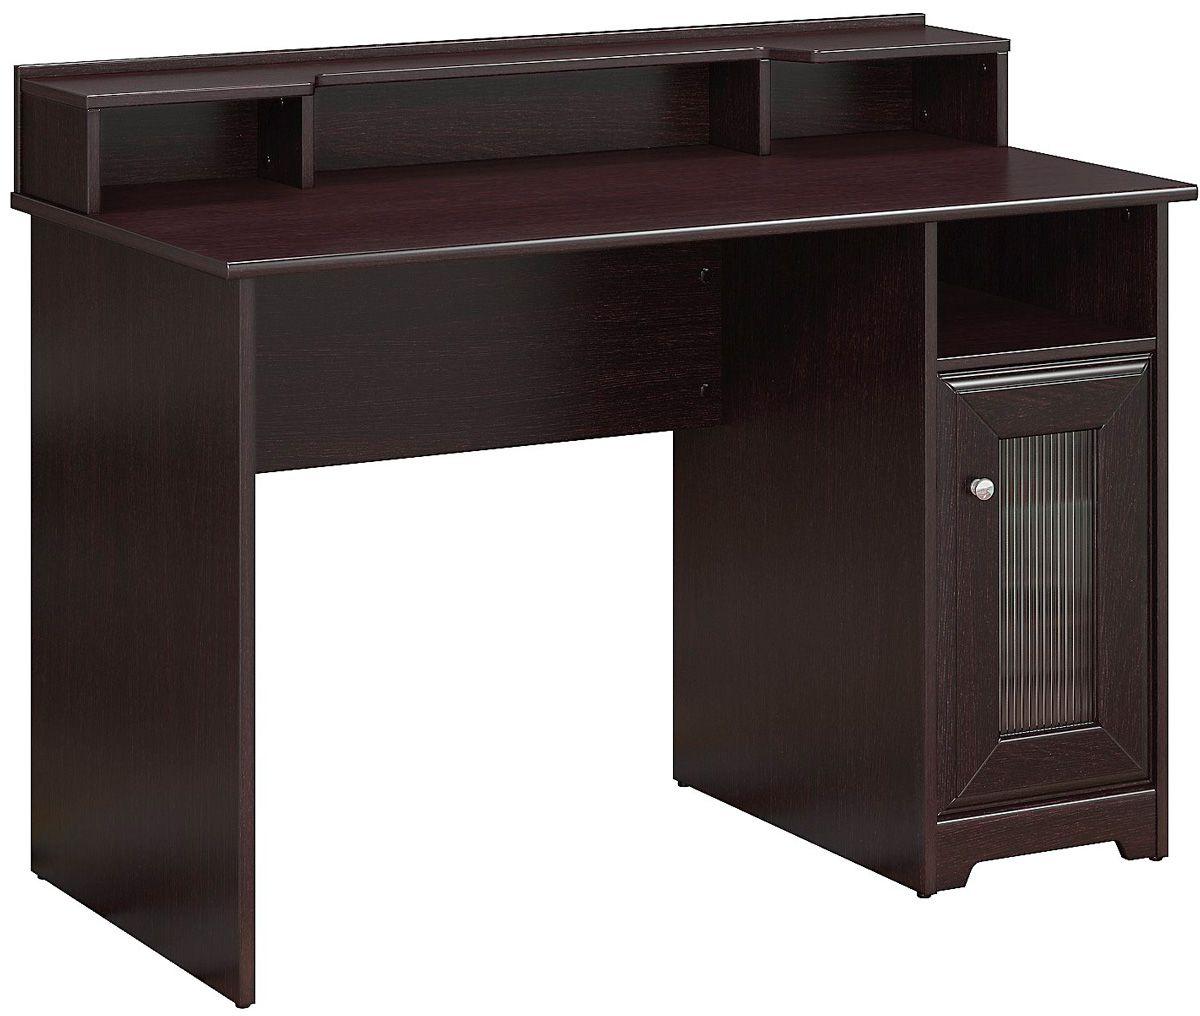 Bush furniture cabot espresso oak single pedestal desk for Bush furniture